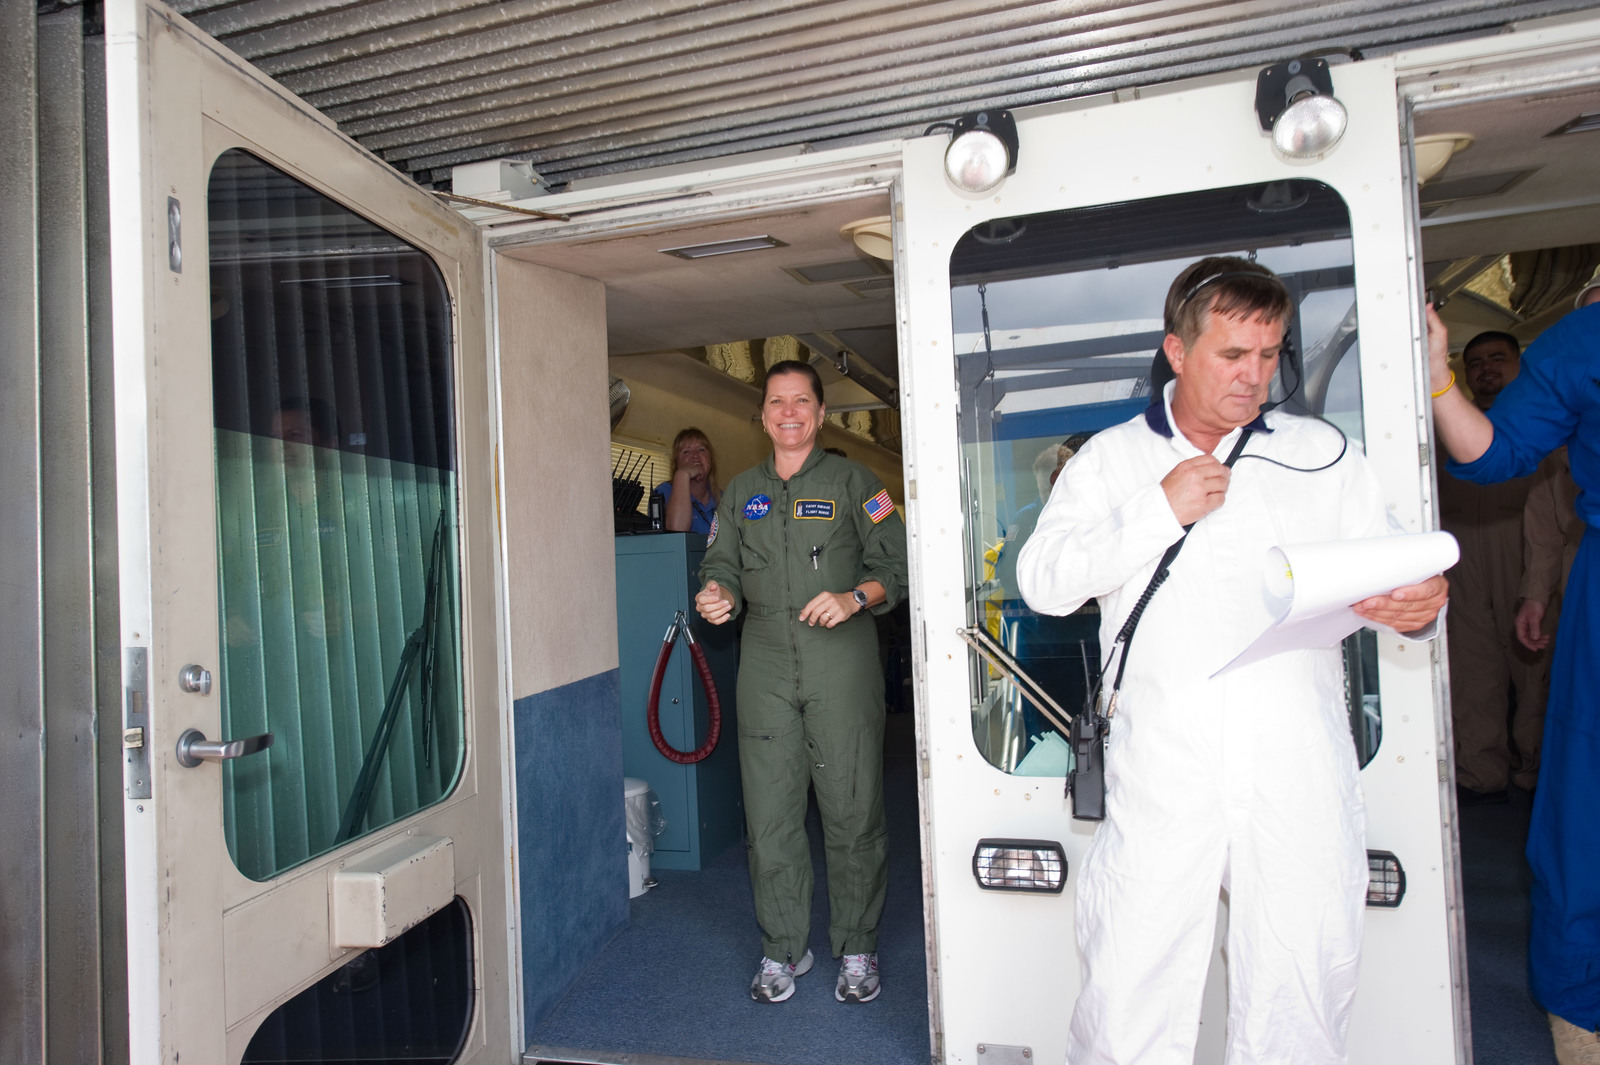 s133E013607 - STS-133 - Post landing